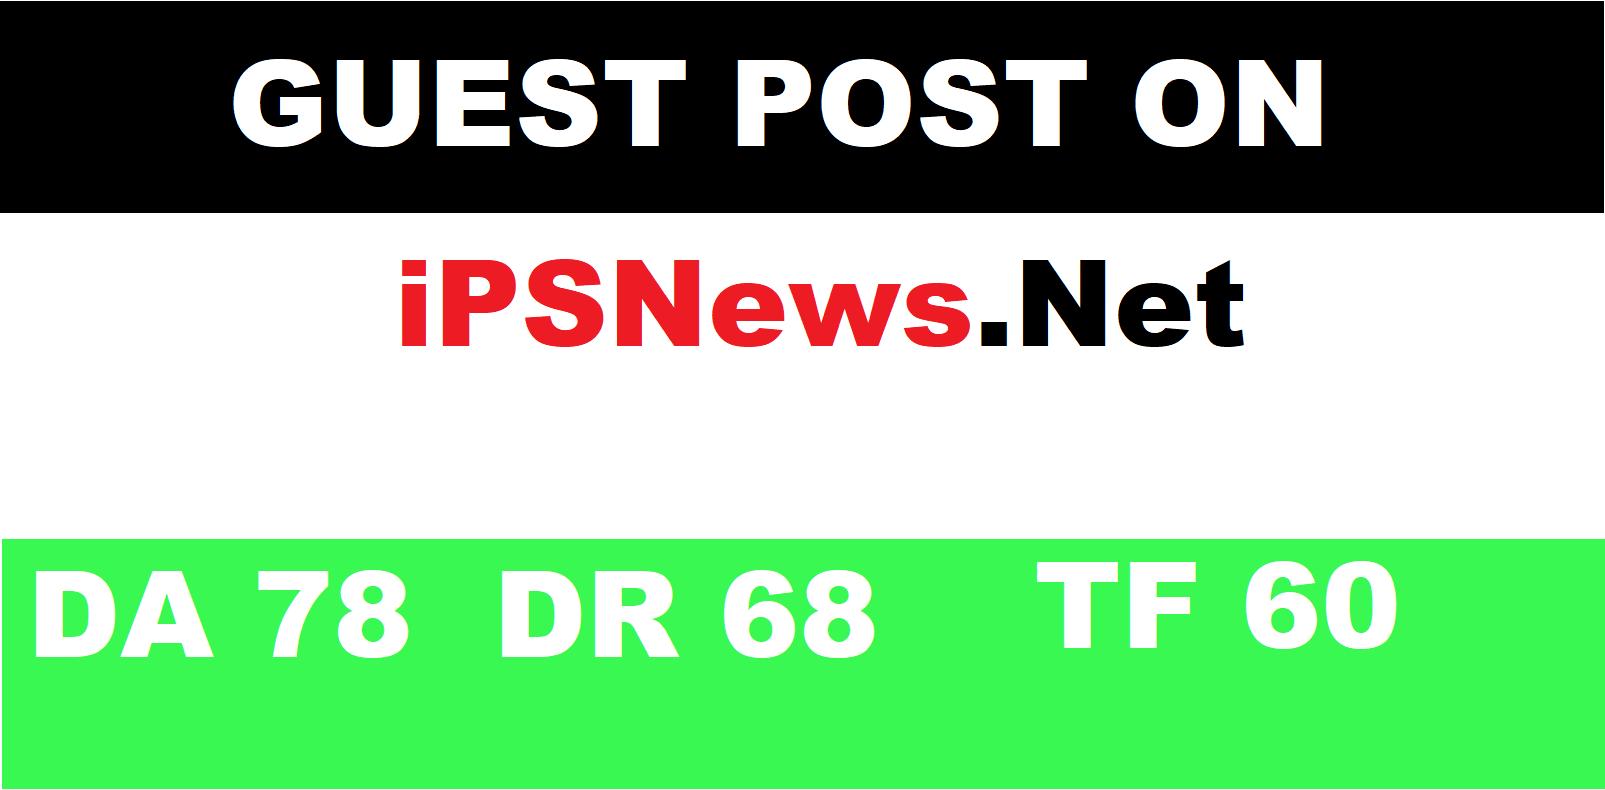 Write & publish guest post on Ipsnews. net DA679